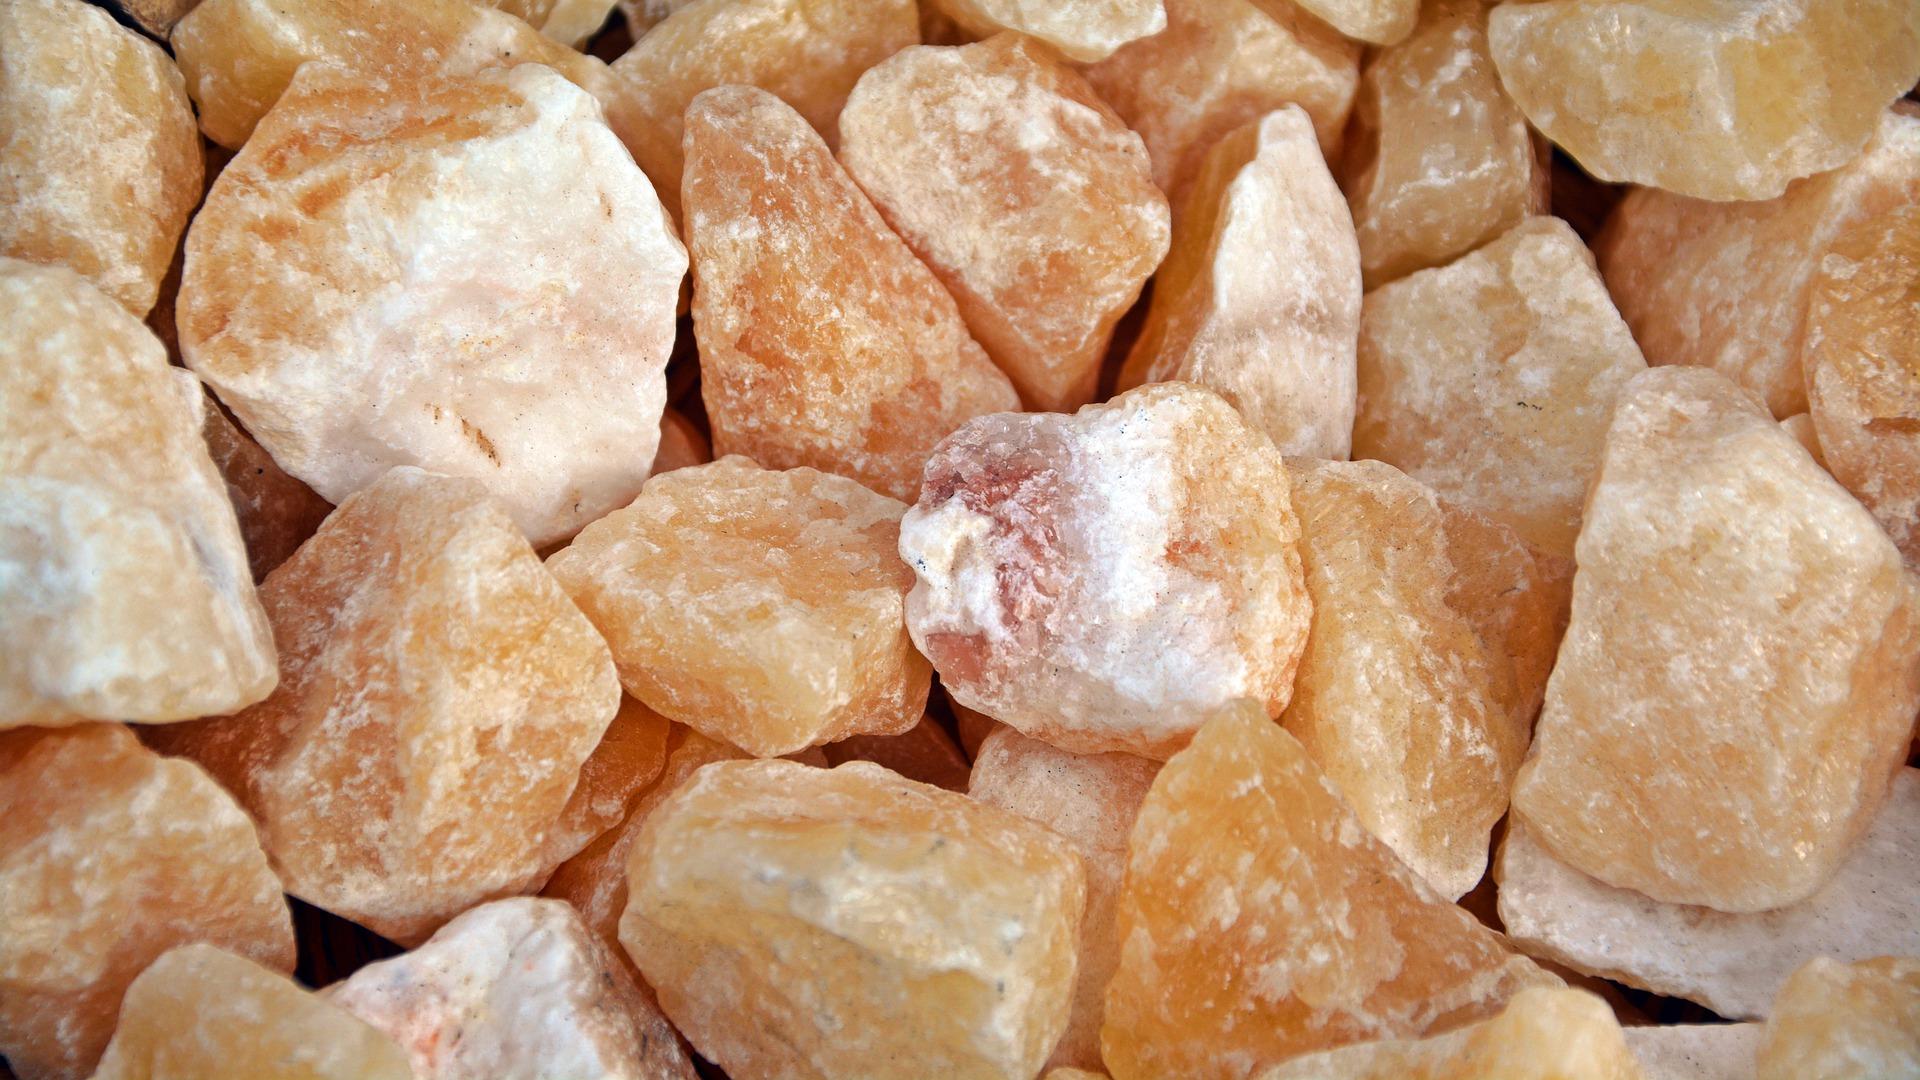 honey-calcite-4478256_1920